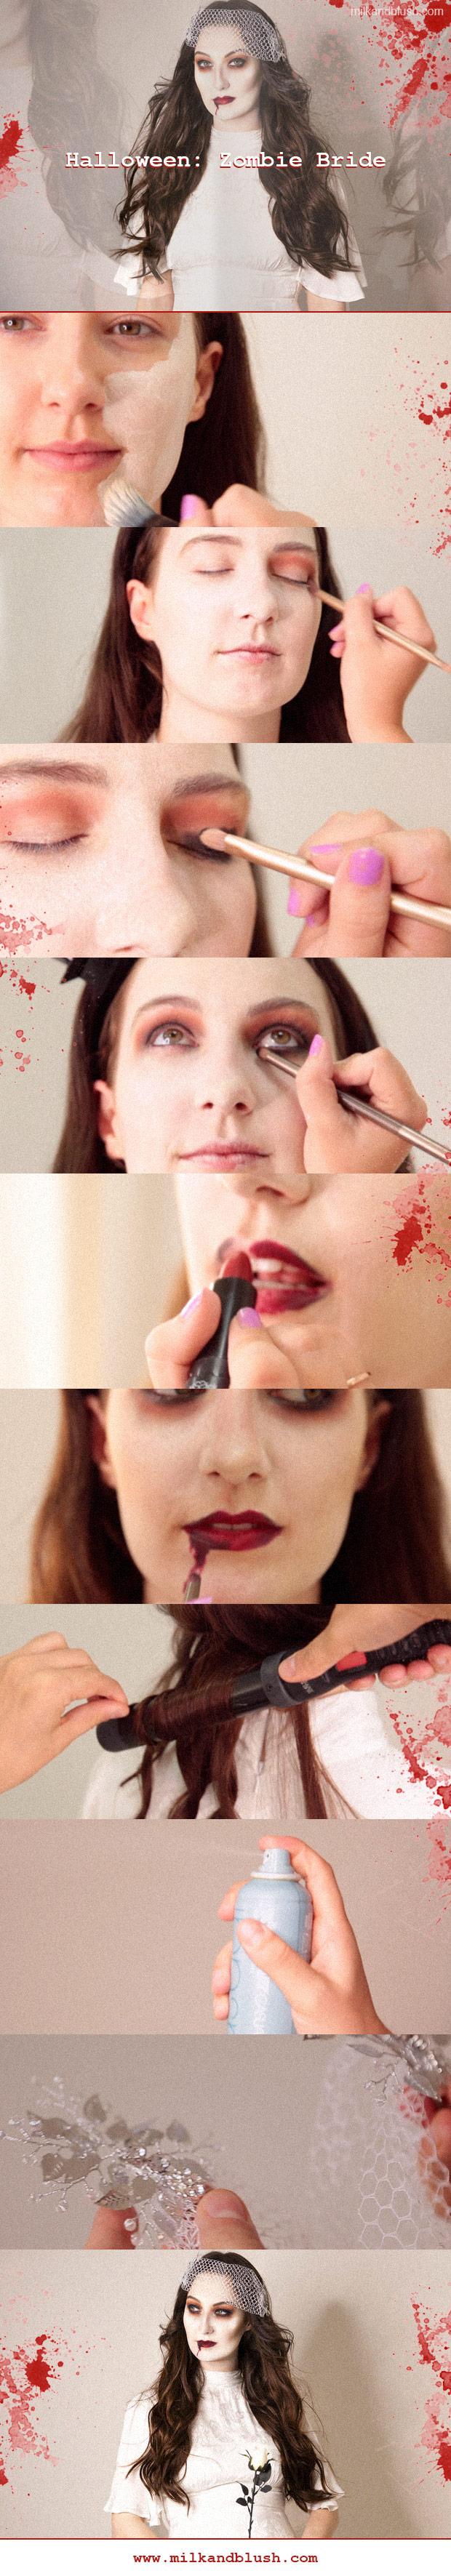 milk-and-blush-halloween-zombie-bride